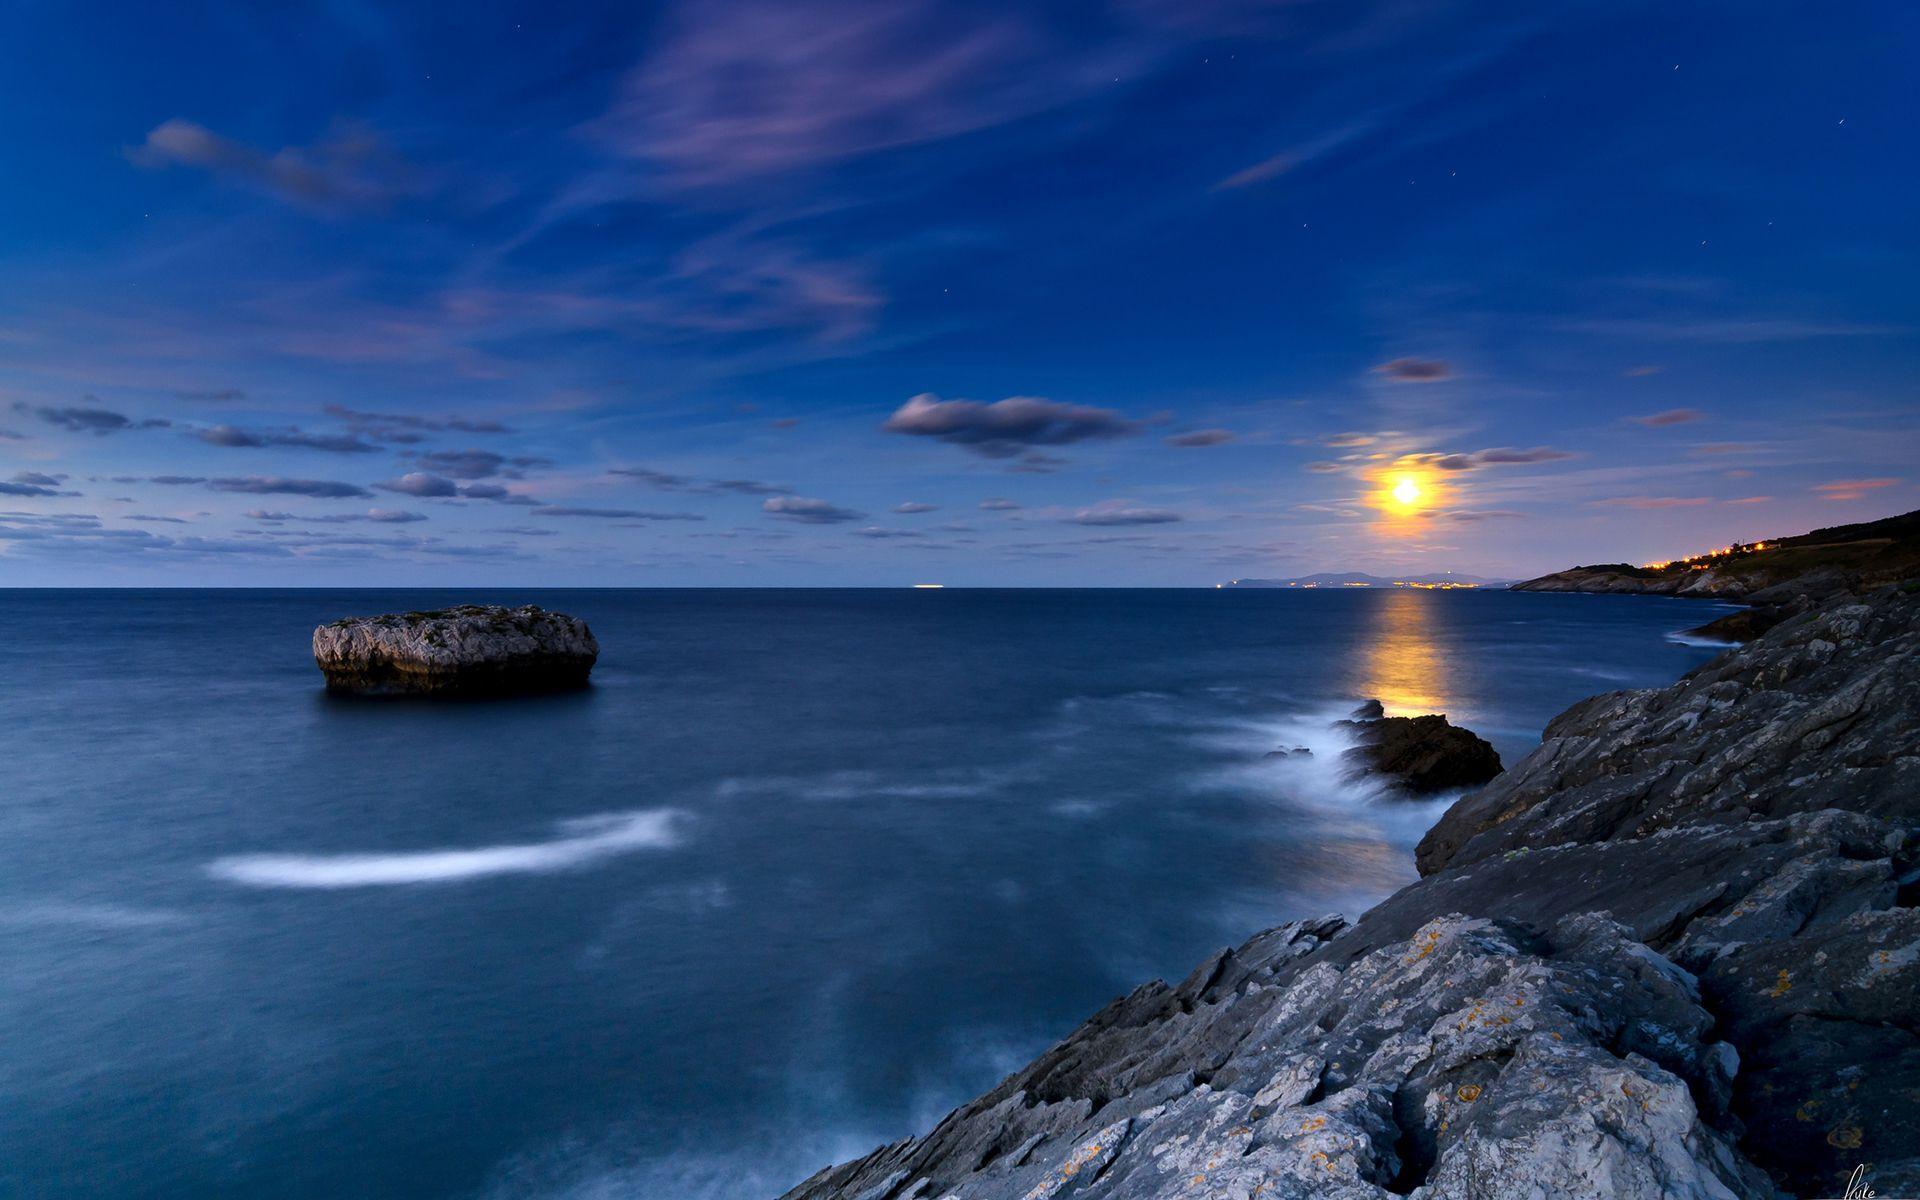 Wonderful Rocky Shore Under The Stars wallpaper free